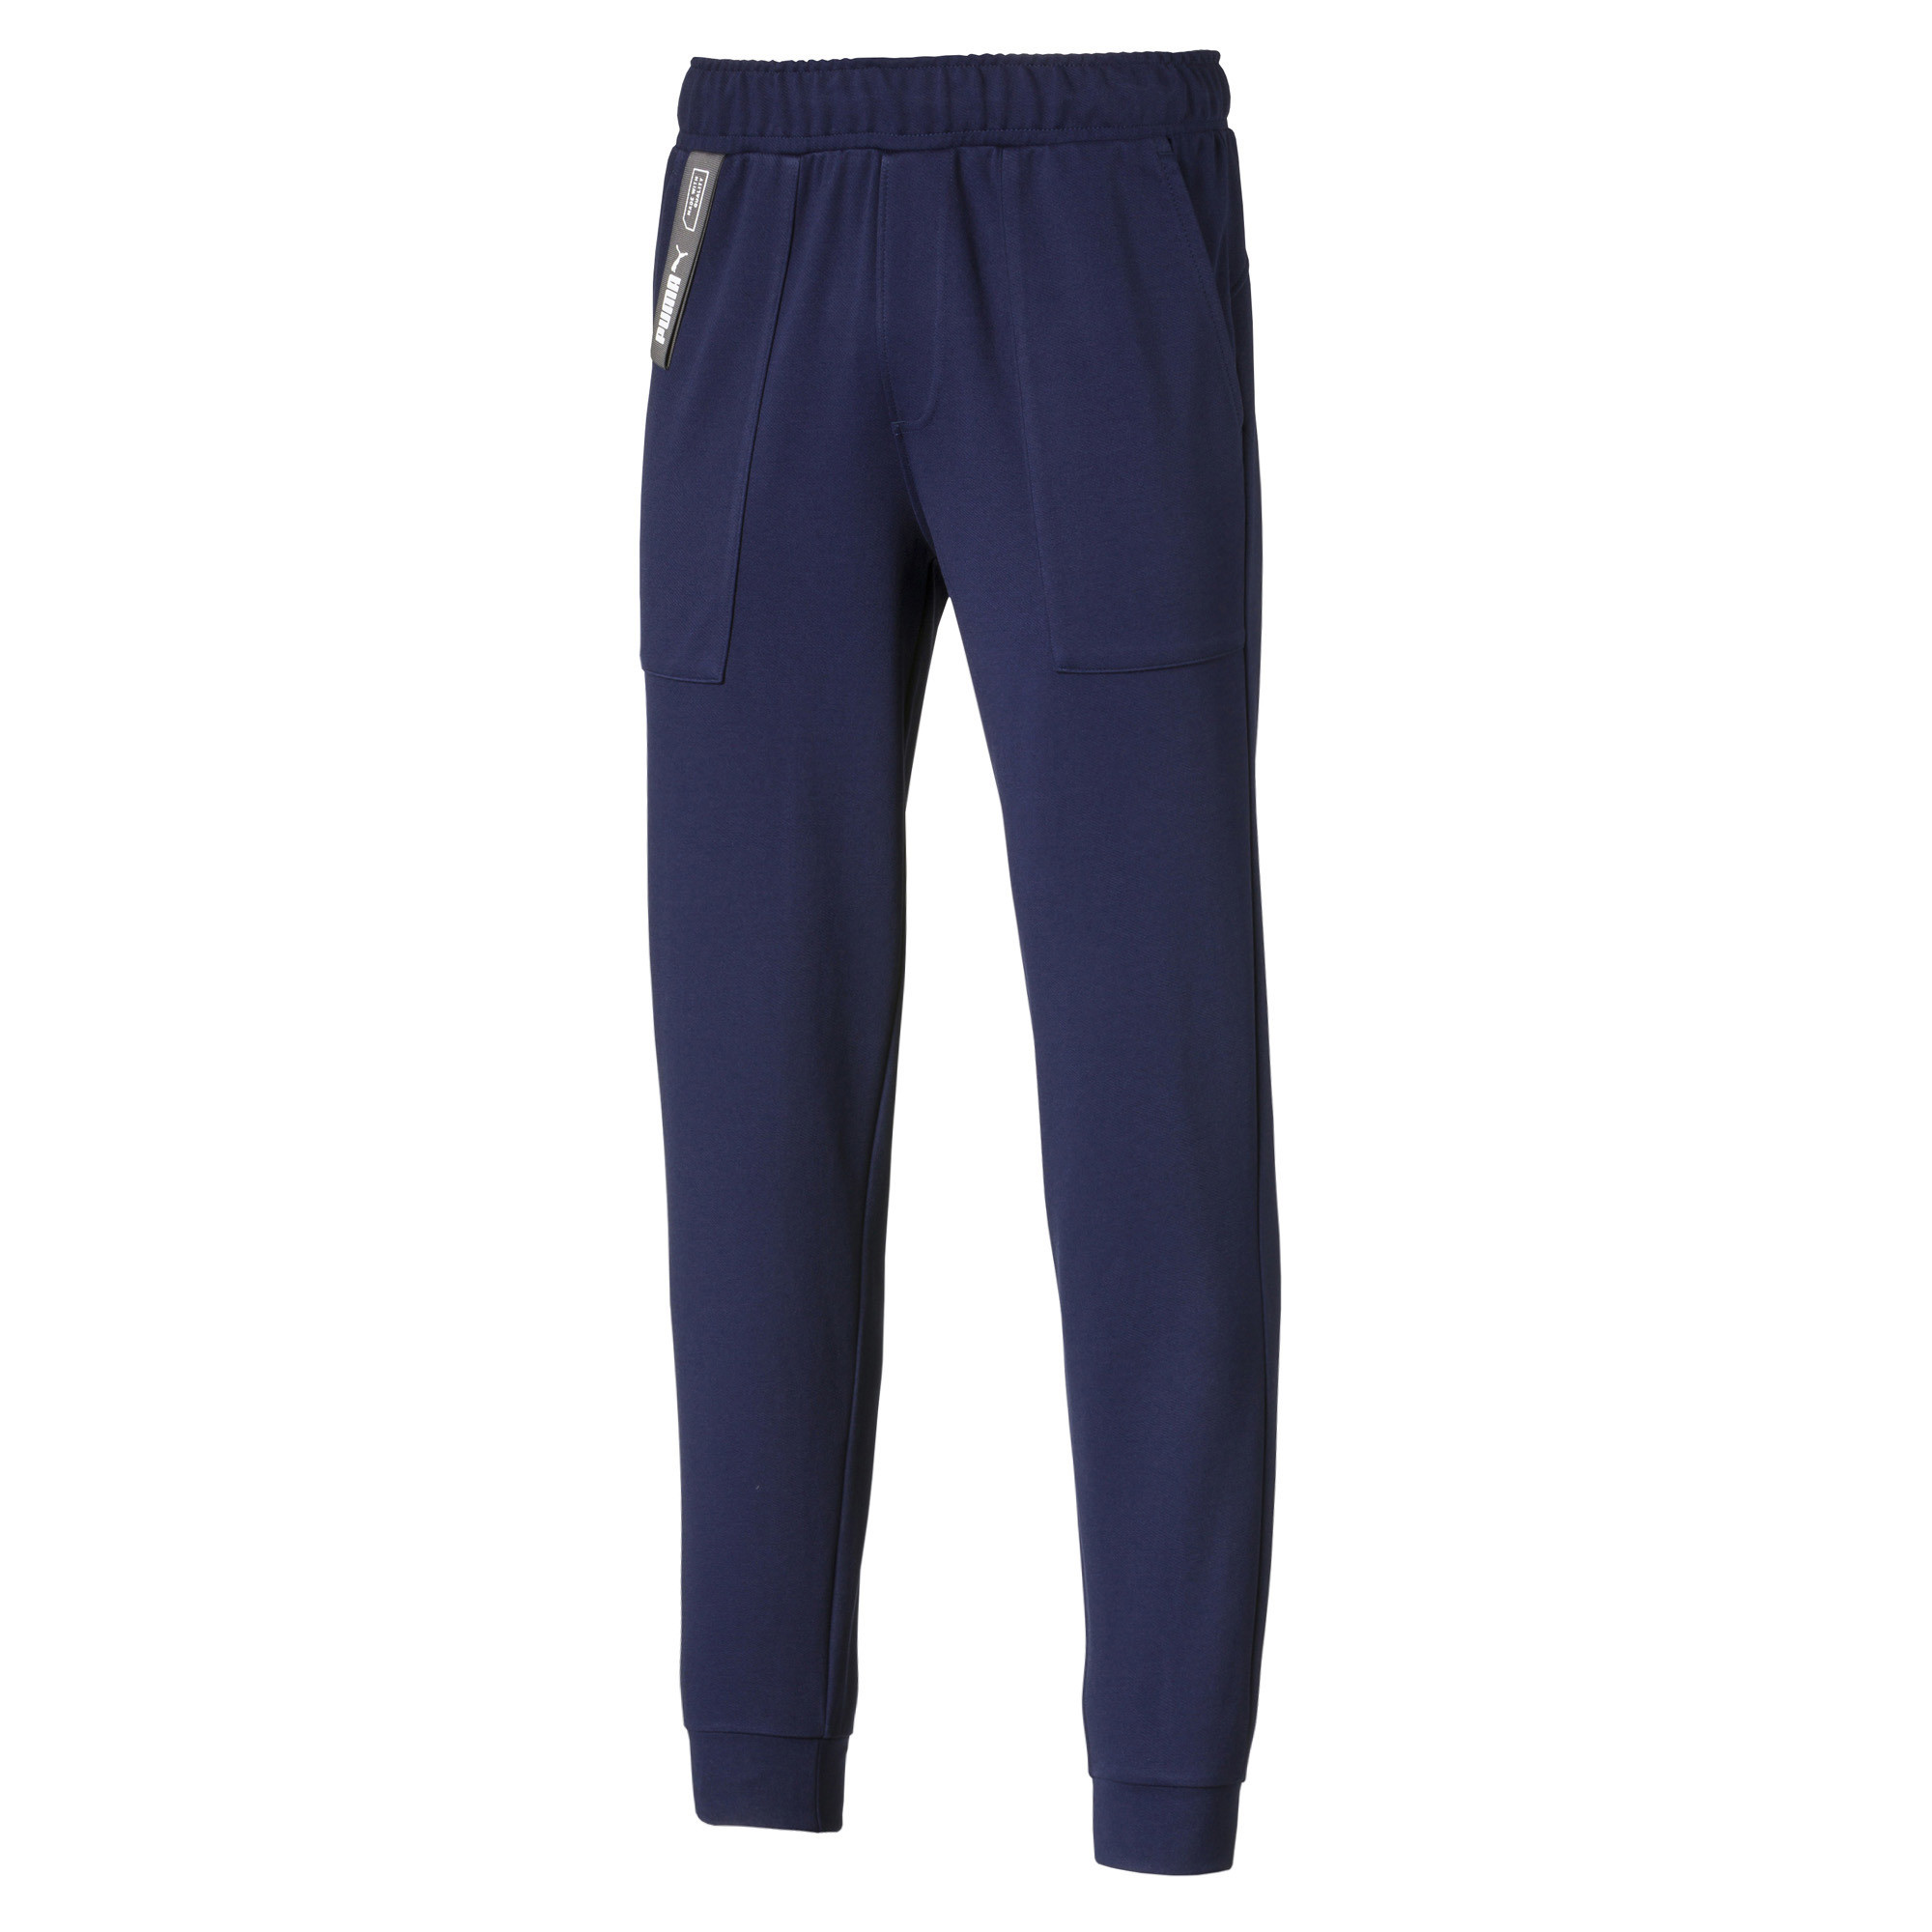 PUMA-NU-TILITY-Men-039-s-Sweatpants-Men-Knitted-Pants-Basics thumbnail 7